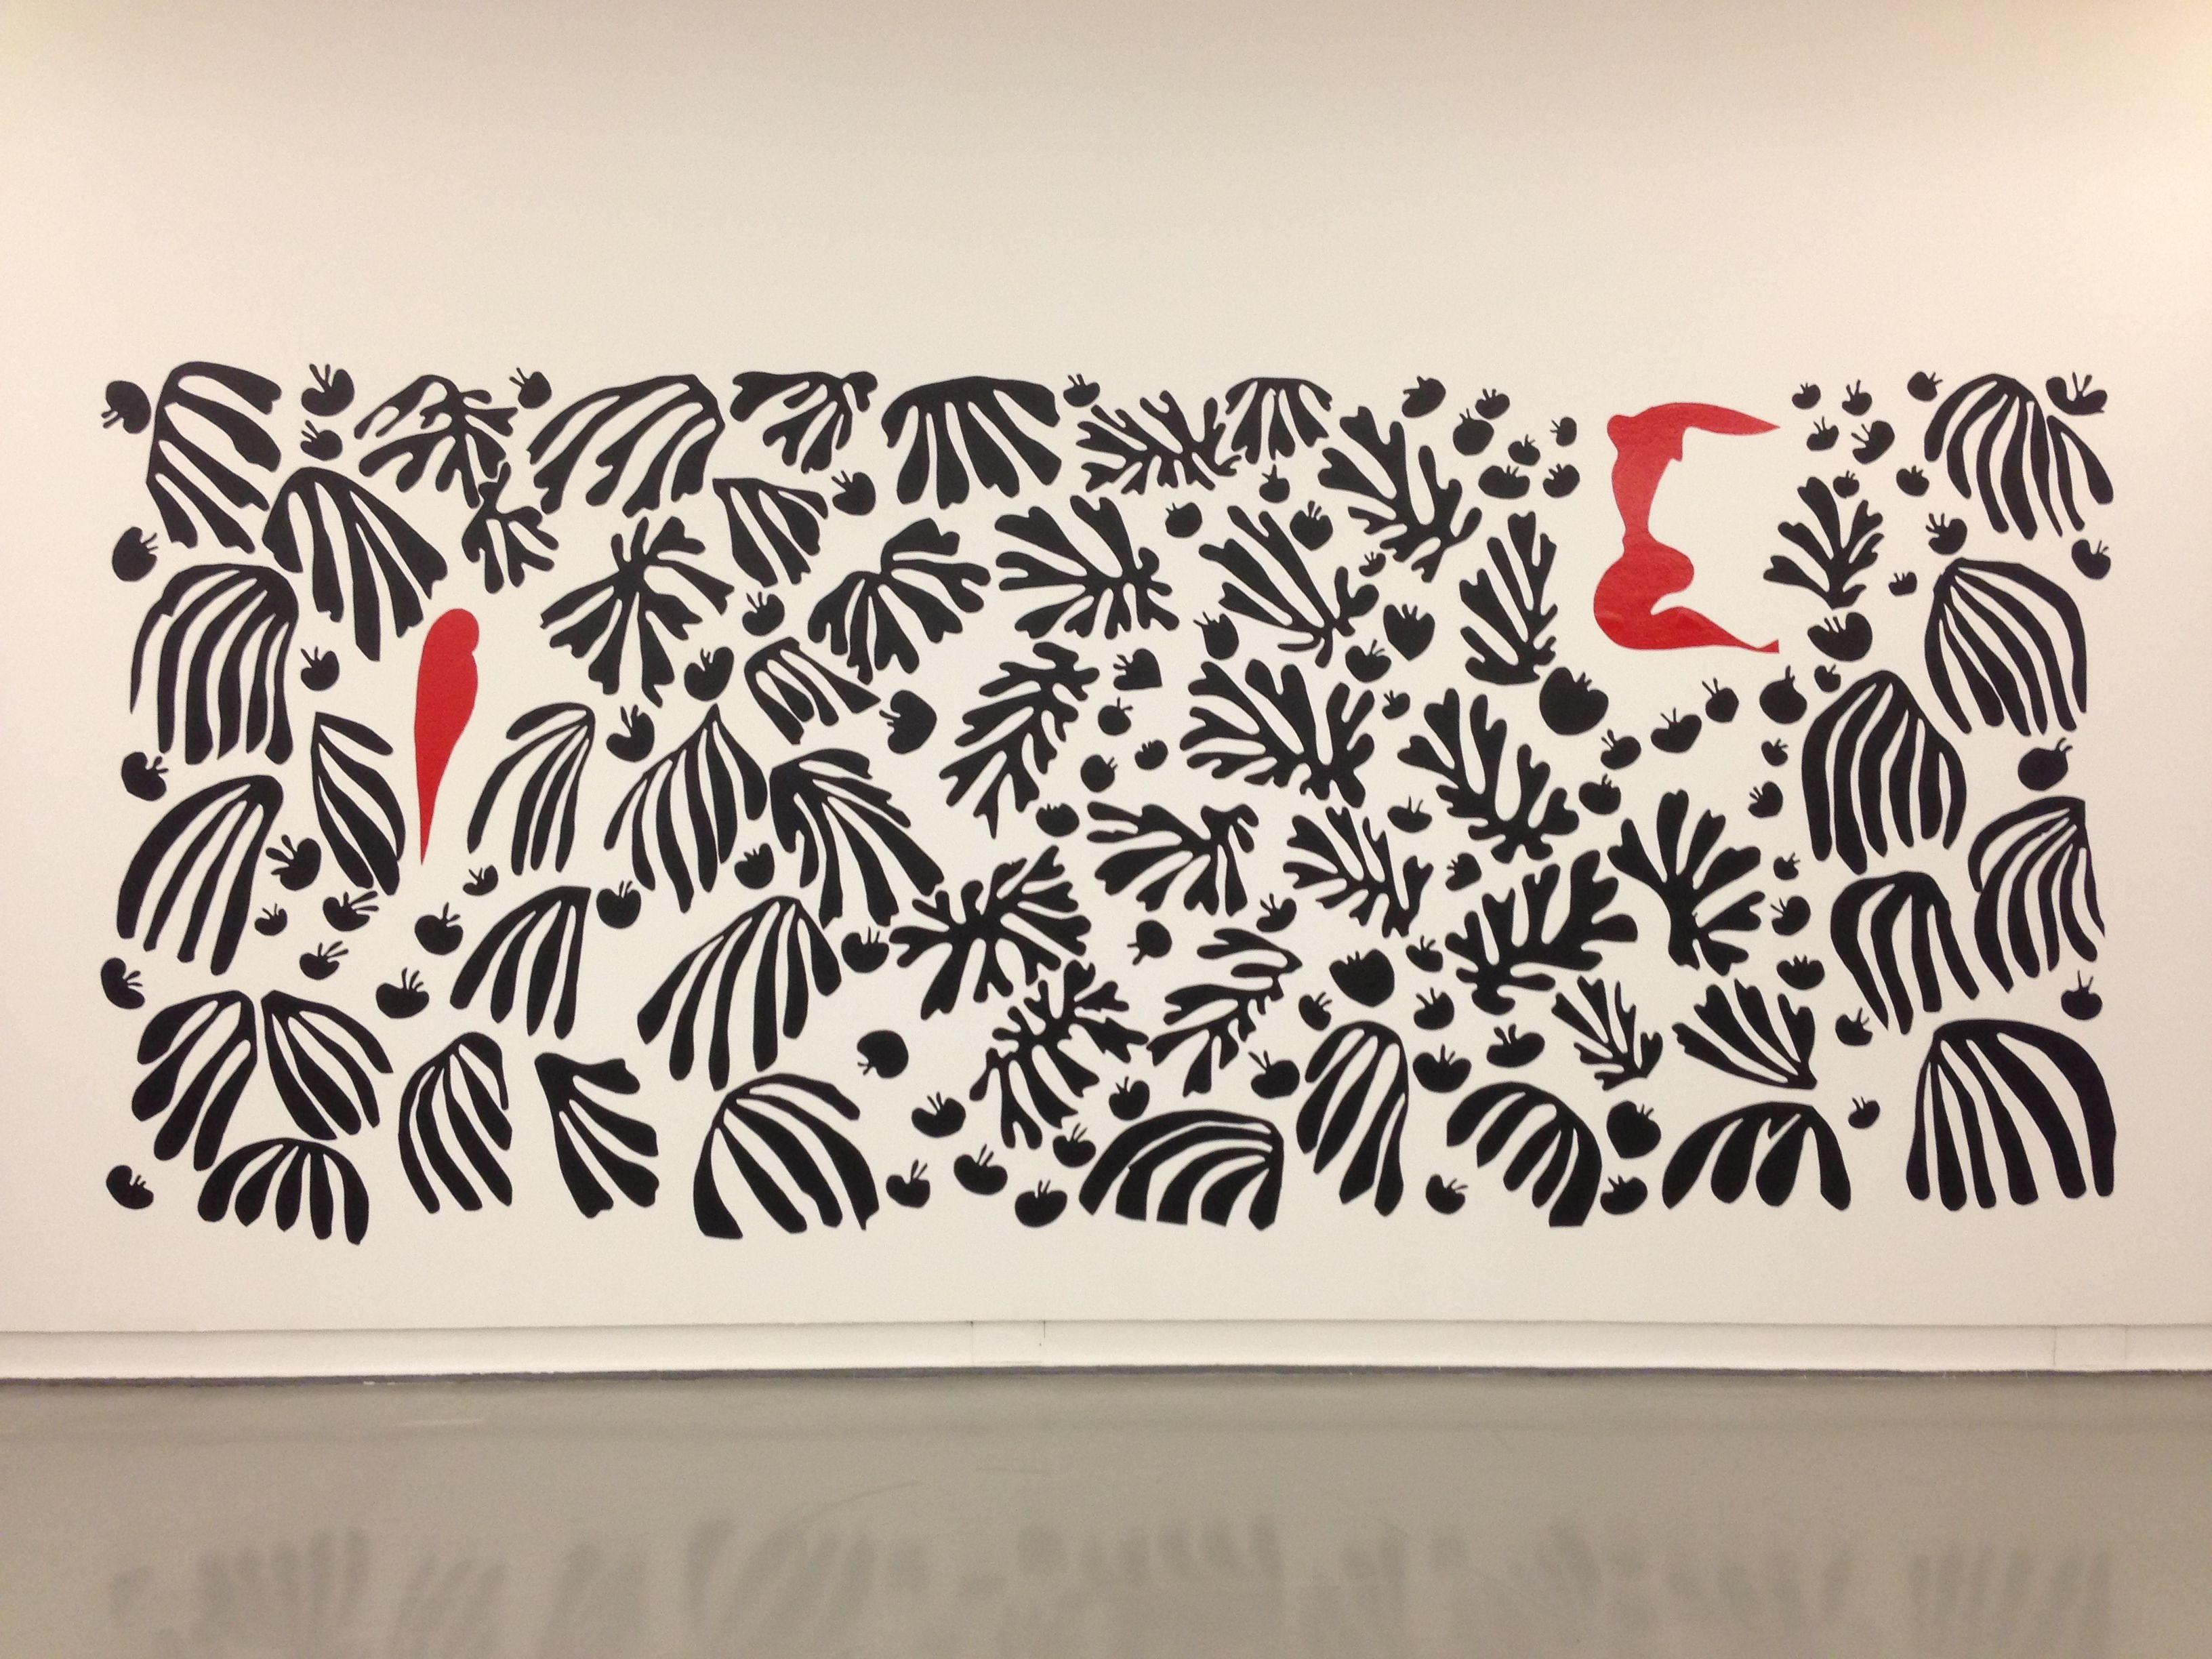 "Patrice Carré, Exhibition ""Bonjour M. Matisse!"" at MAMAC, Nice, Côte d'Azur, by yourguideboba.com"